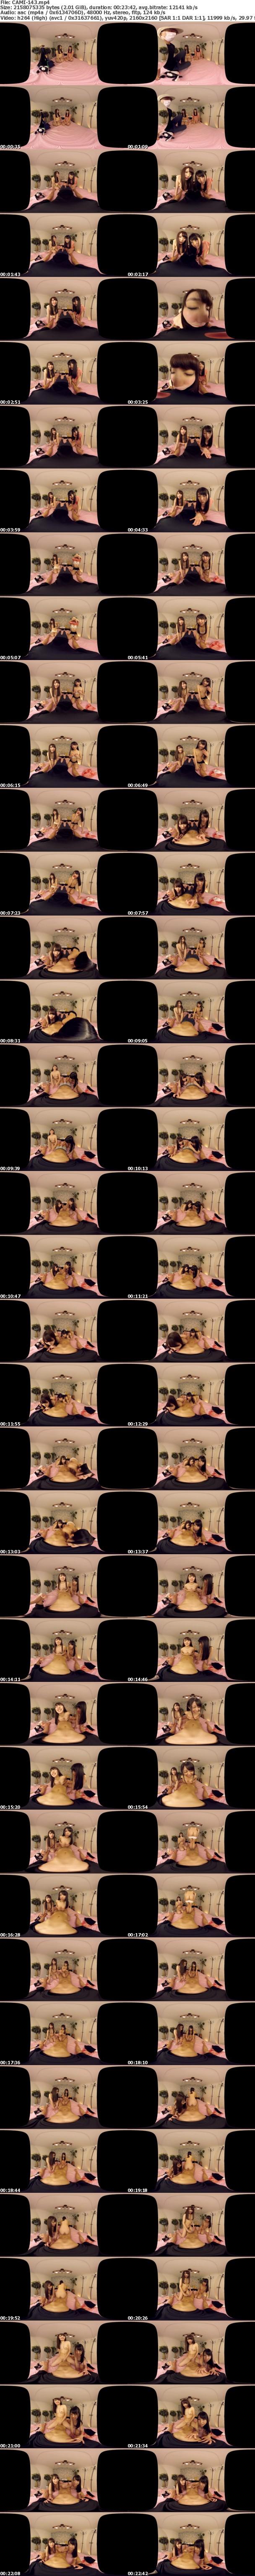 VR/3D [CAMI-143] 【VR】業界初!ナンパした女を連れ込み言葉巧みにVRで撮影。個人的に楽しむなんて嘘に決まってるwww 世界で唯一のVRハメ撮り師な俺が撮った映像放出 vol.1